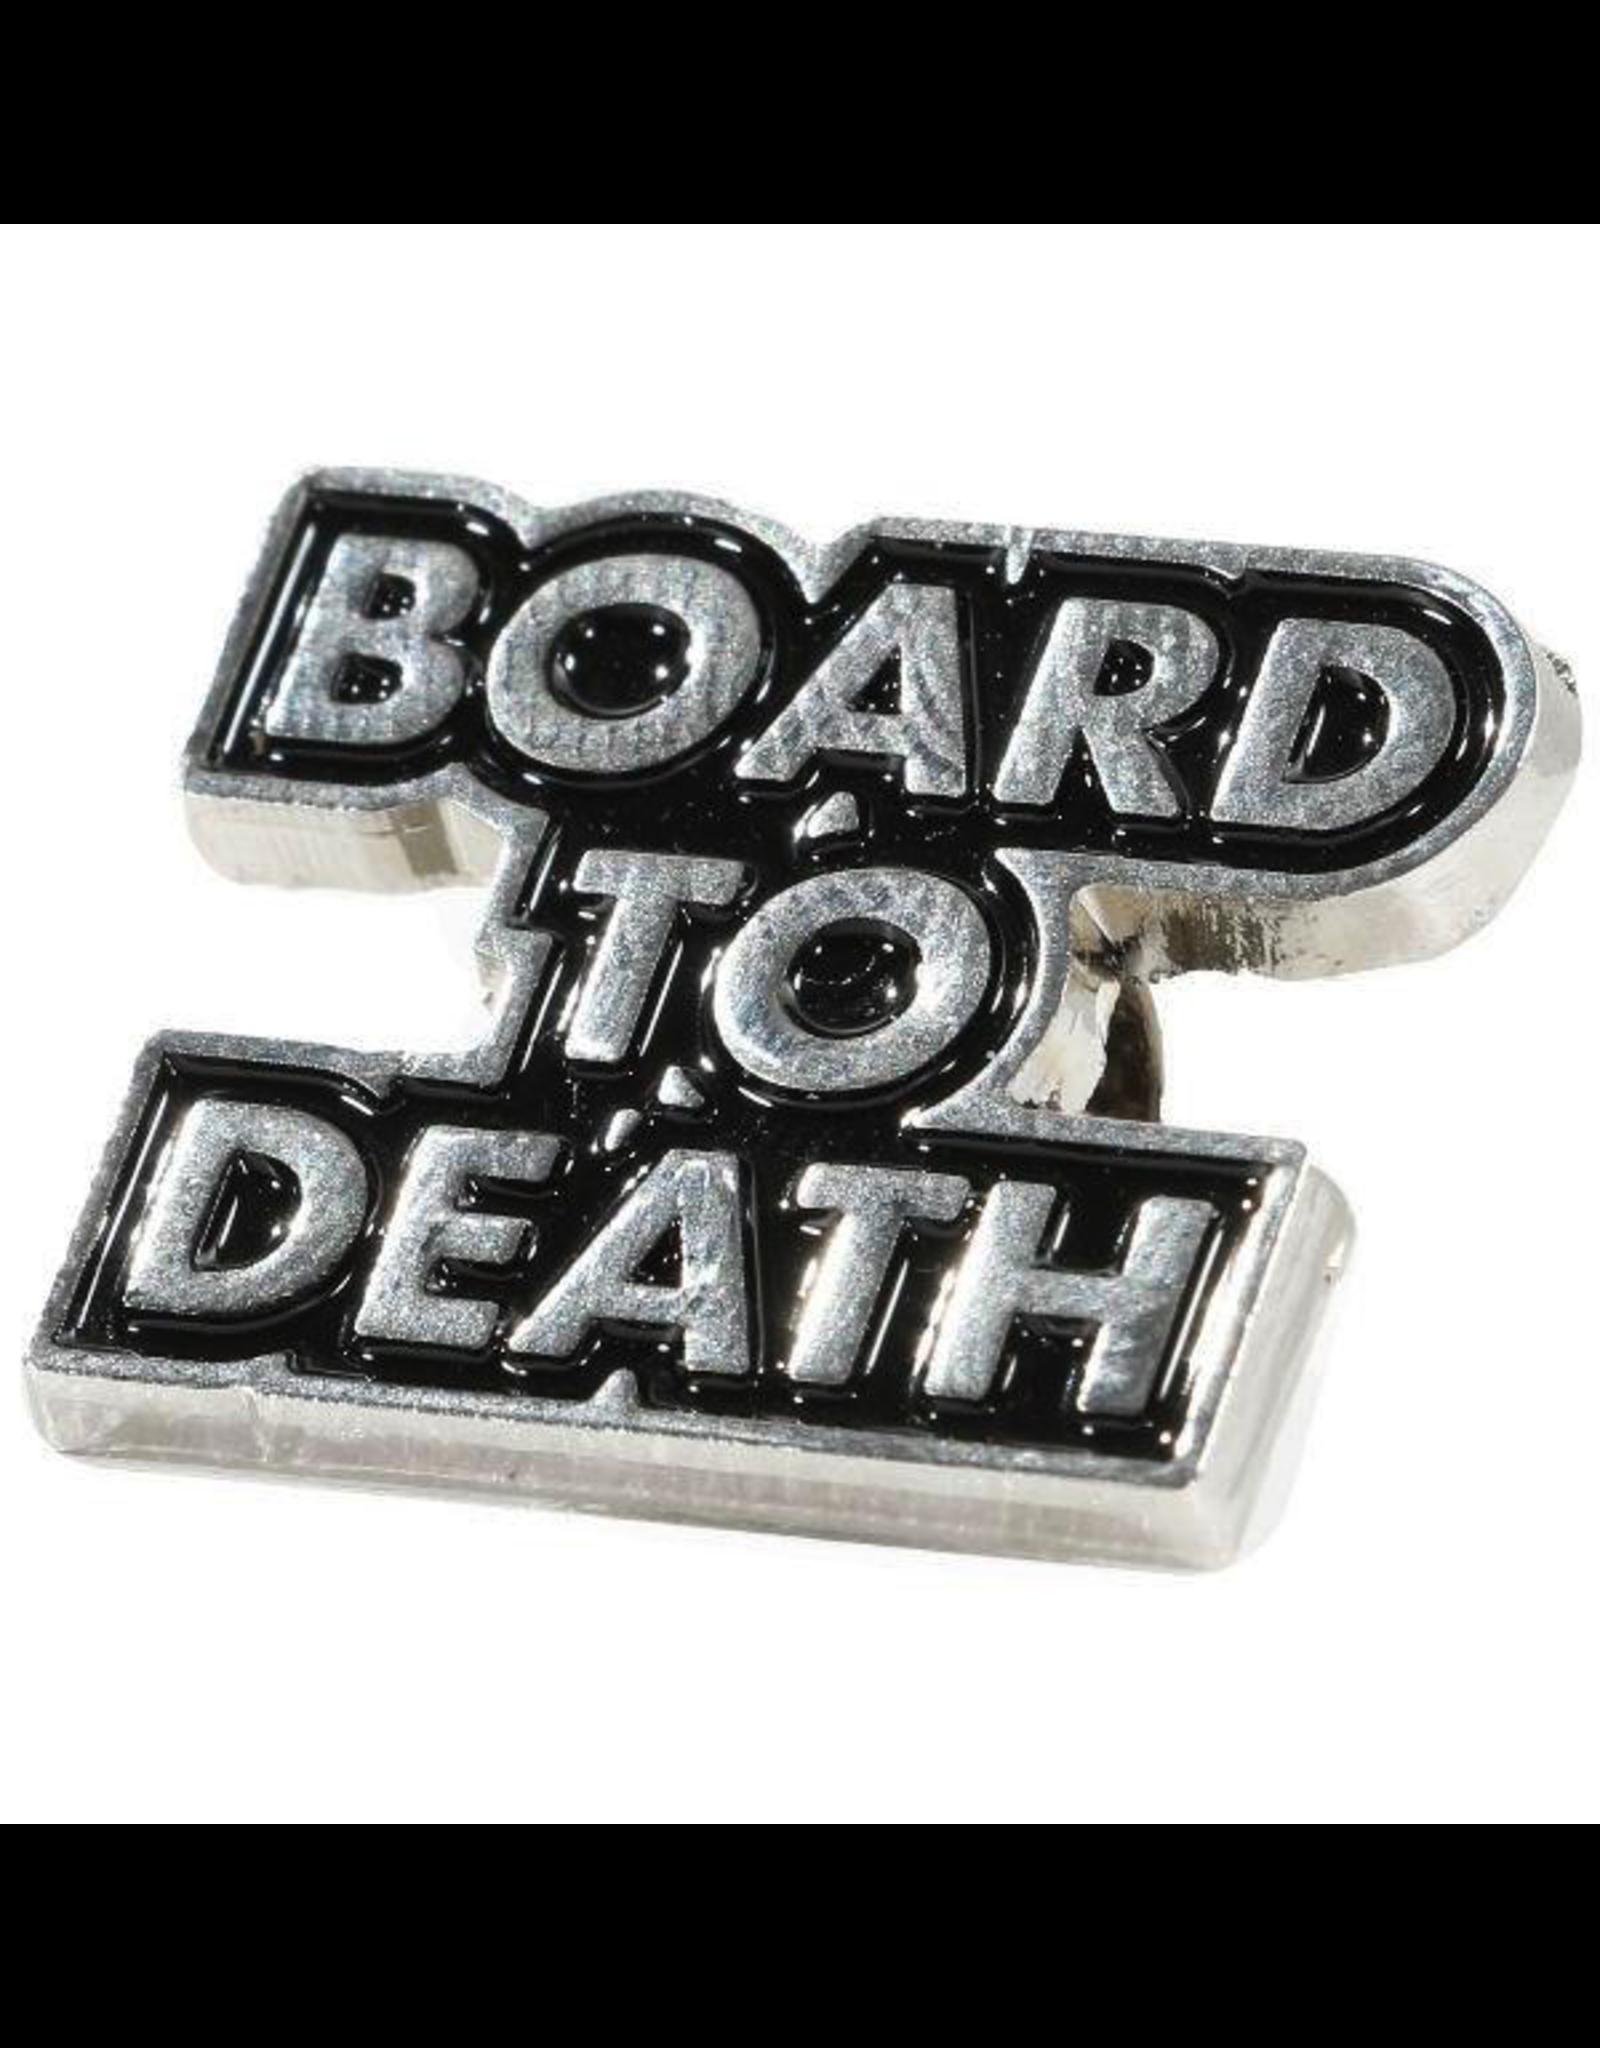 Volume 4 Board to Death Pin